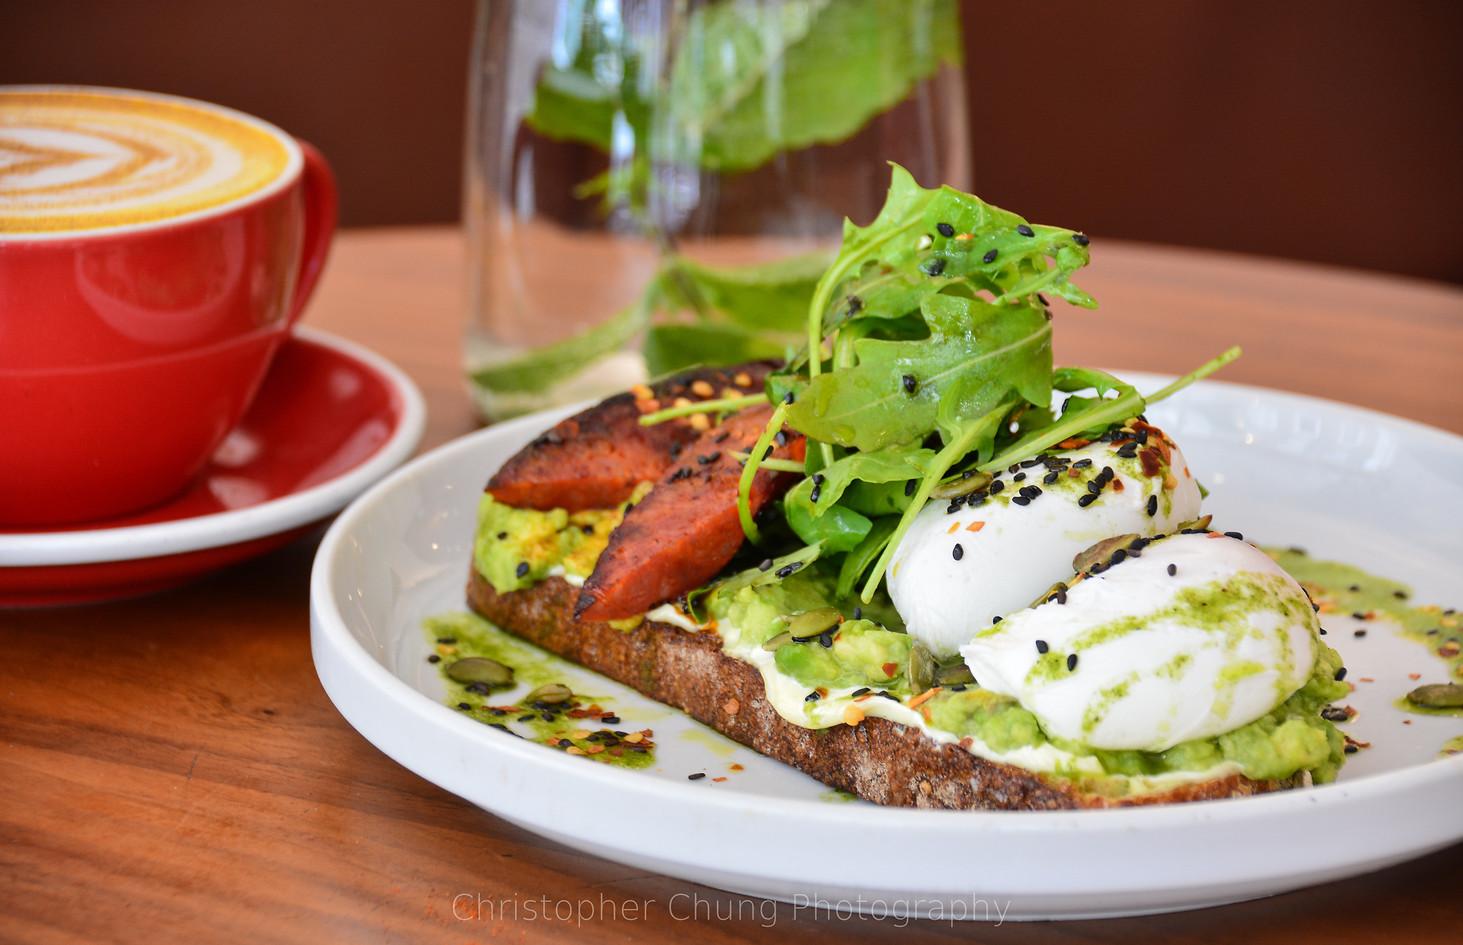 Poached egg, chorizo & Avocado on Toast